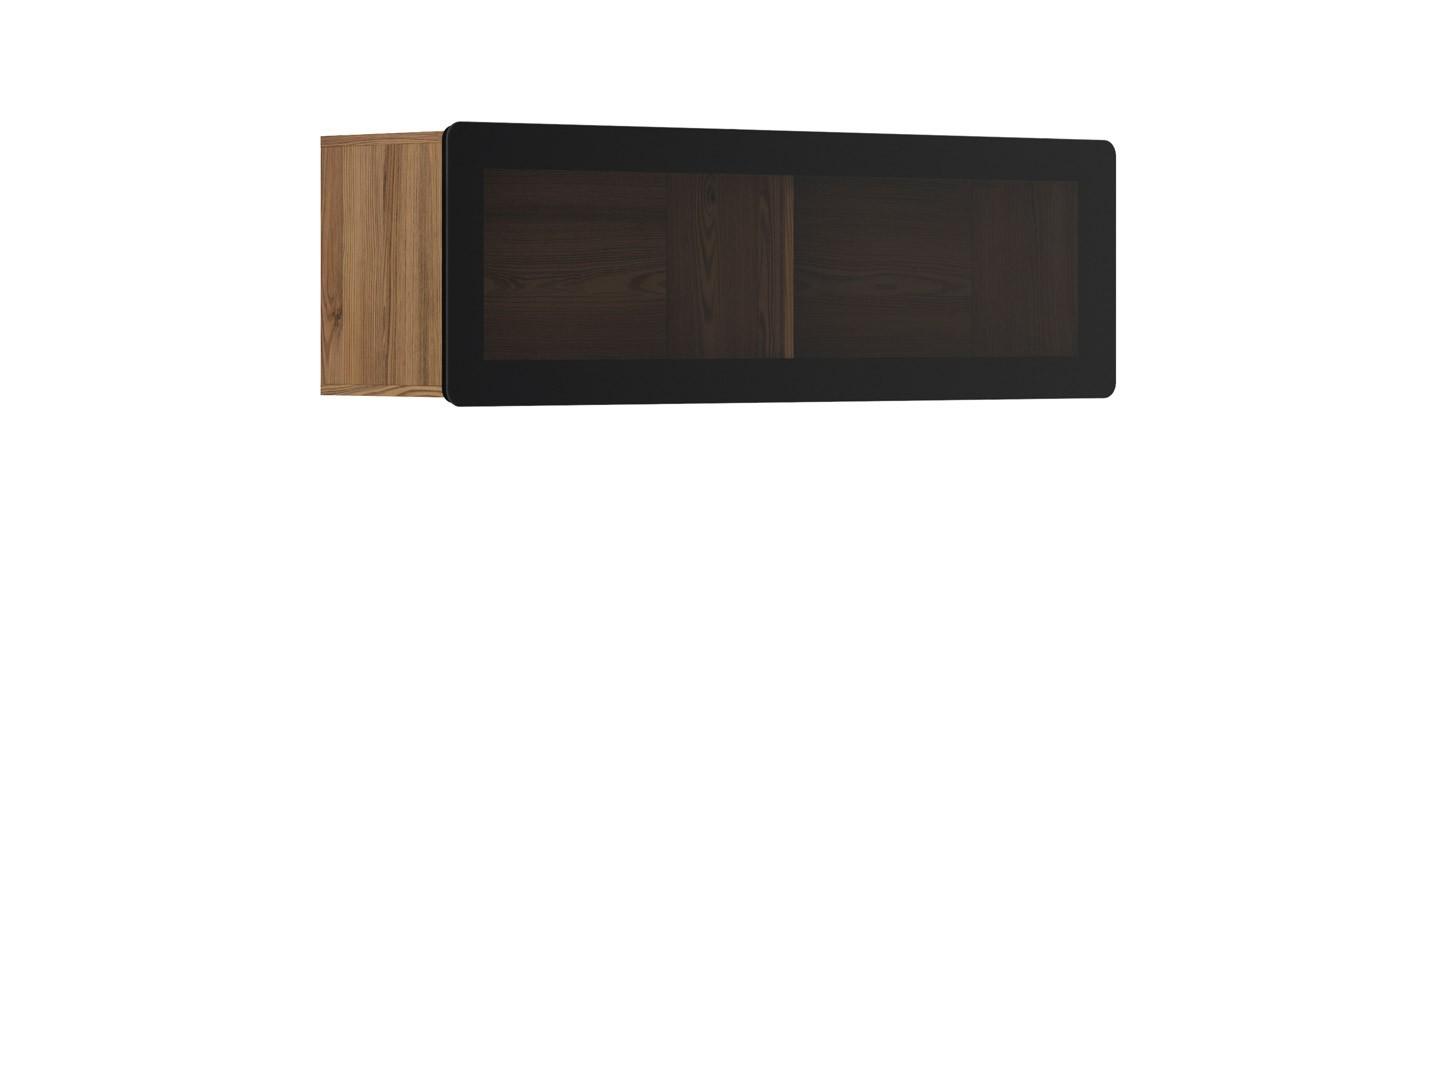 Vitrína na zeď - BRW - Possi Light - SFW1WK/4/13 (modřín sibiu zlatý) (s osvětlením)